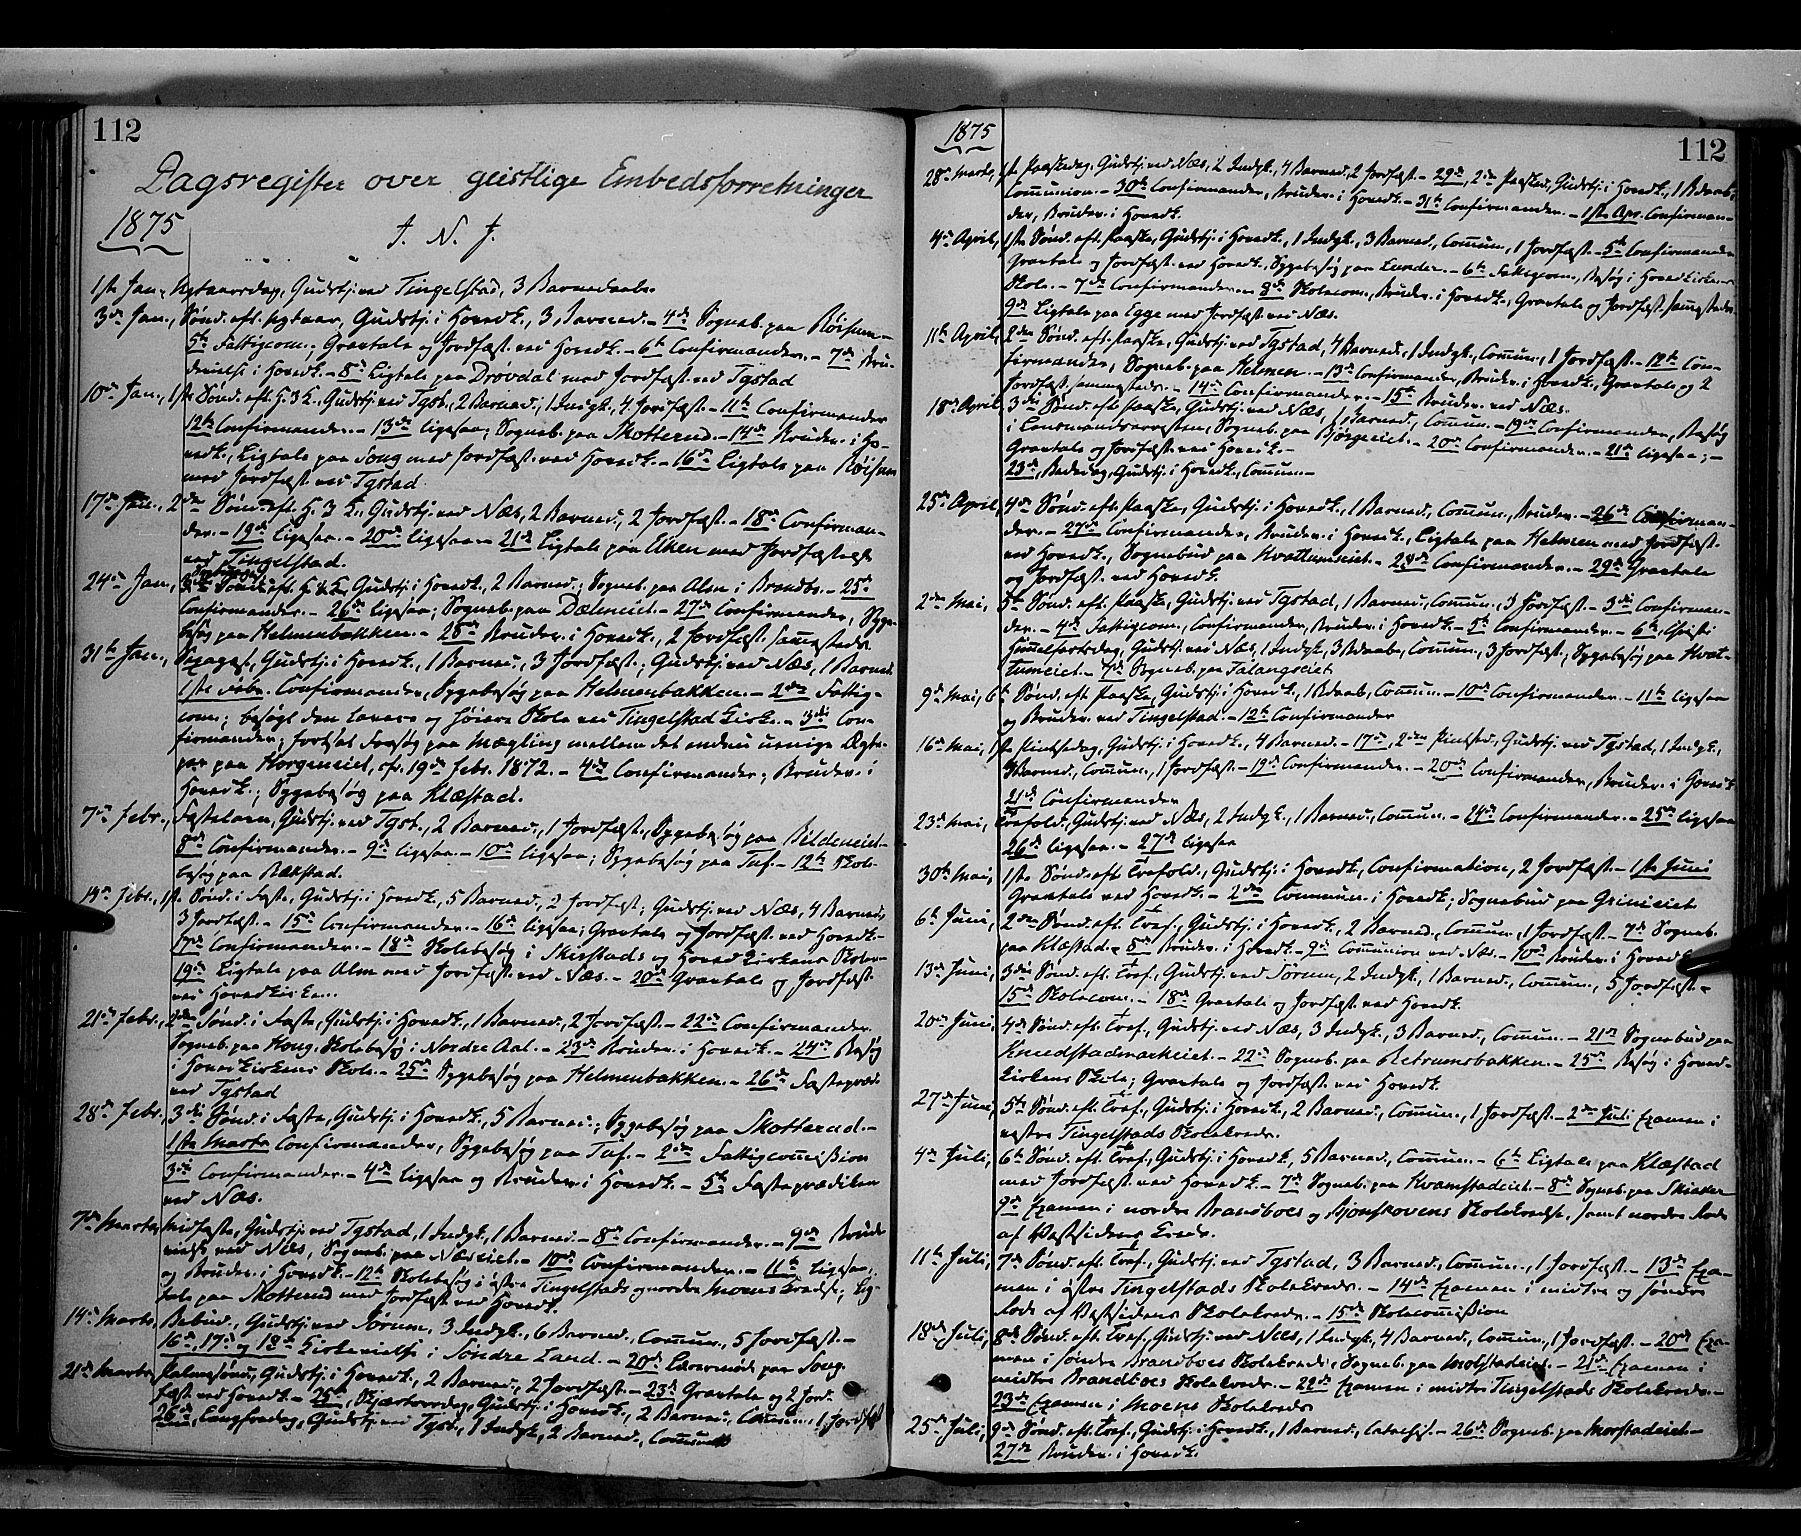 SAH, Gran prestekontor, Parish register (official) no. 13, 1875-1879, p. 112